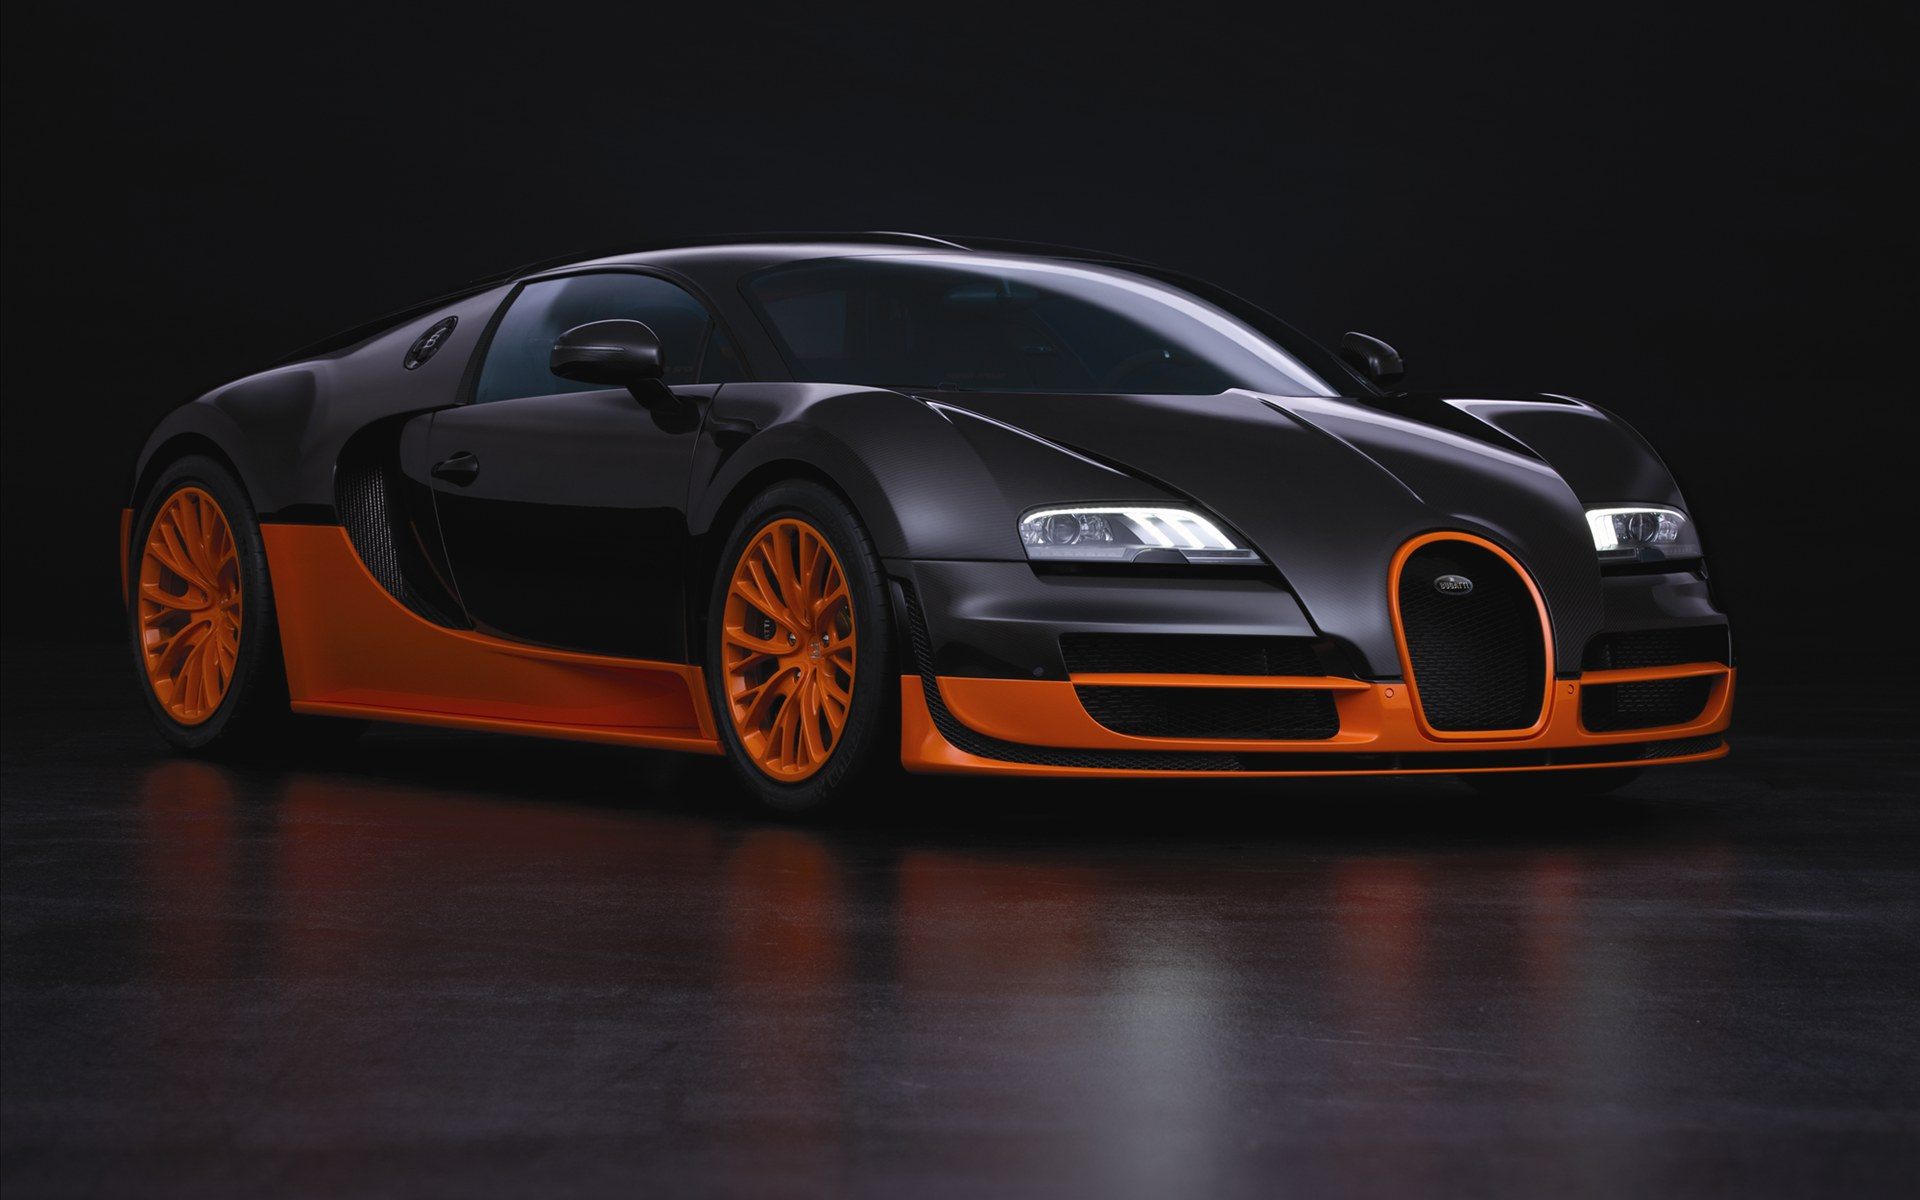 bugatti-veyron-super-sports-car-widescreen-02 Amazing Bugatti Veyron Price In Egypt Cars Trend